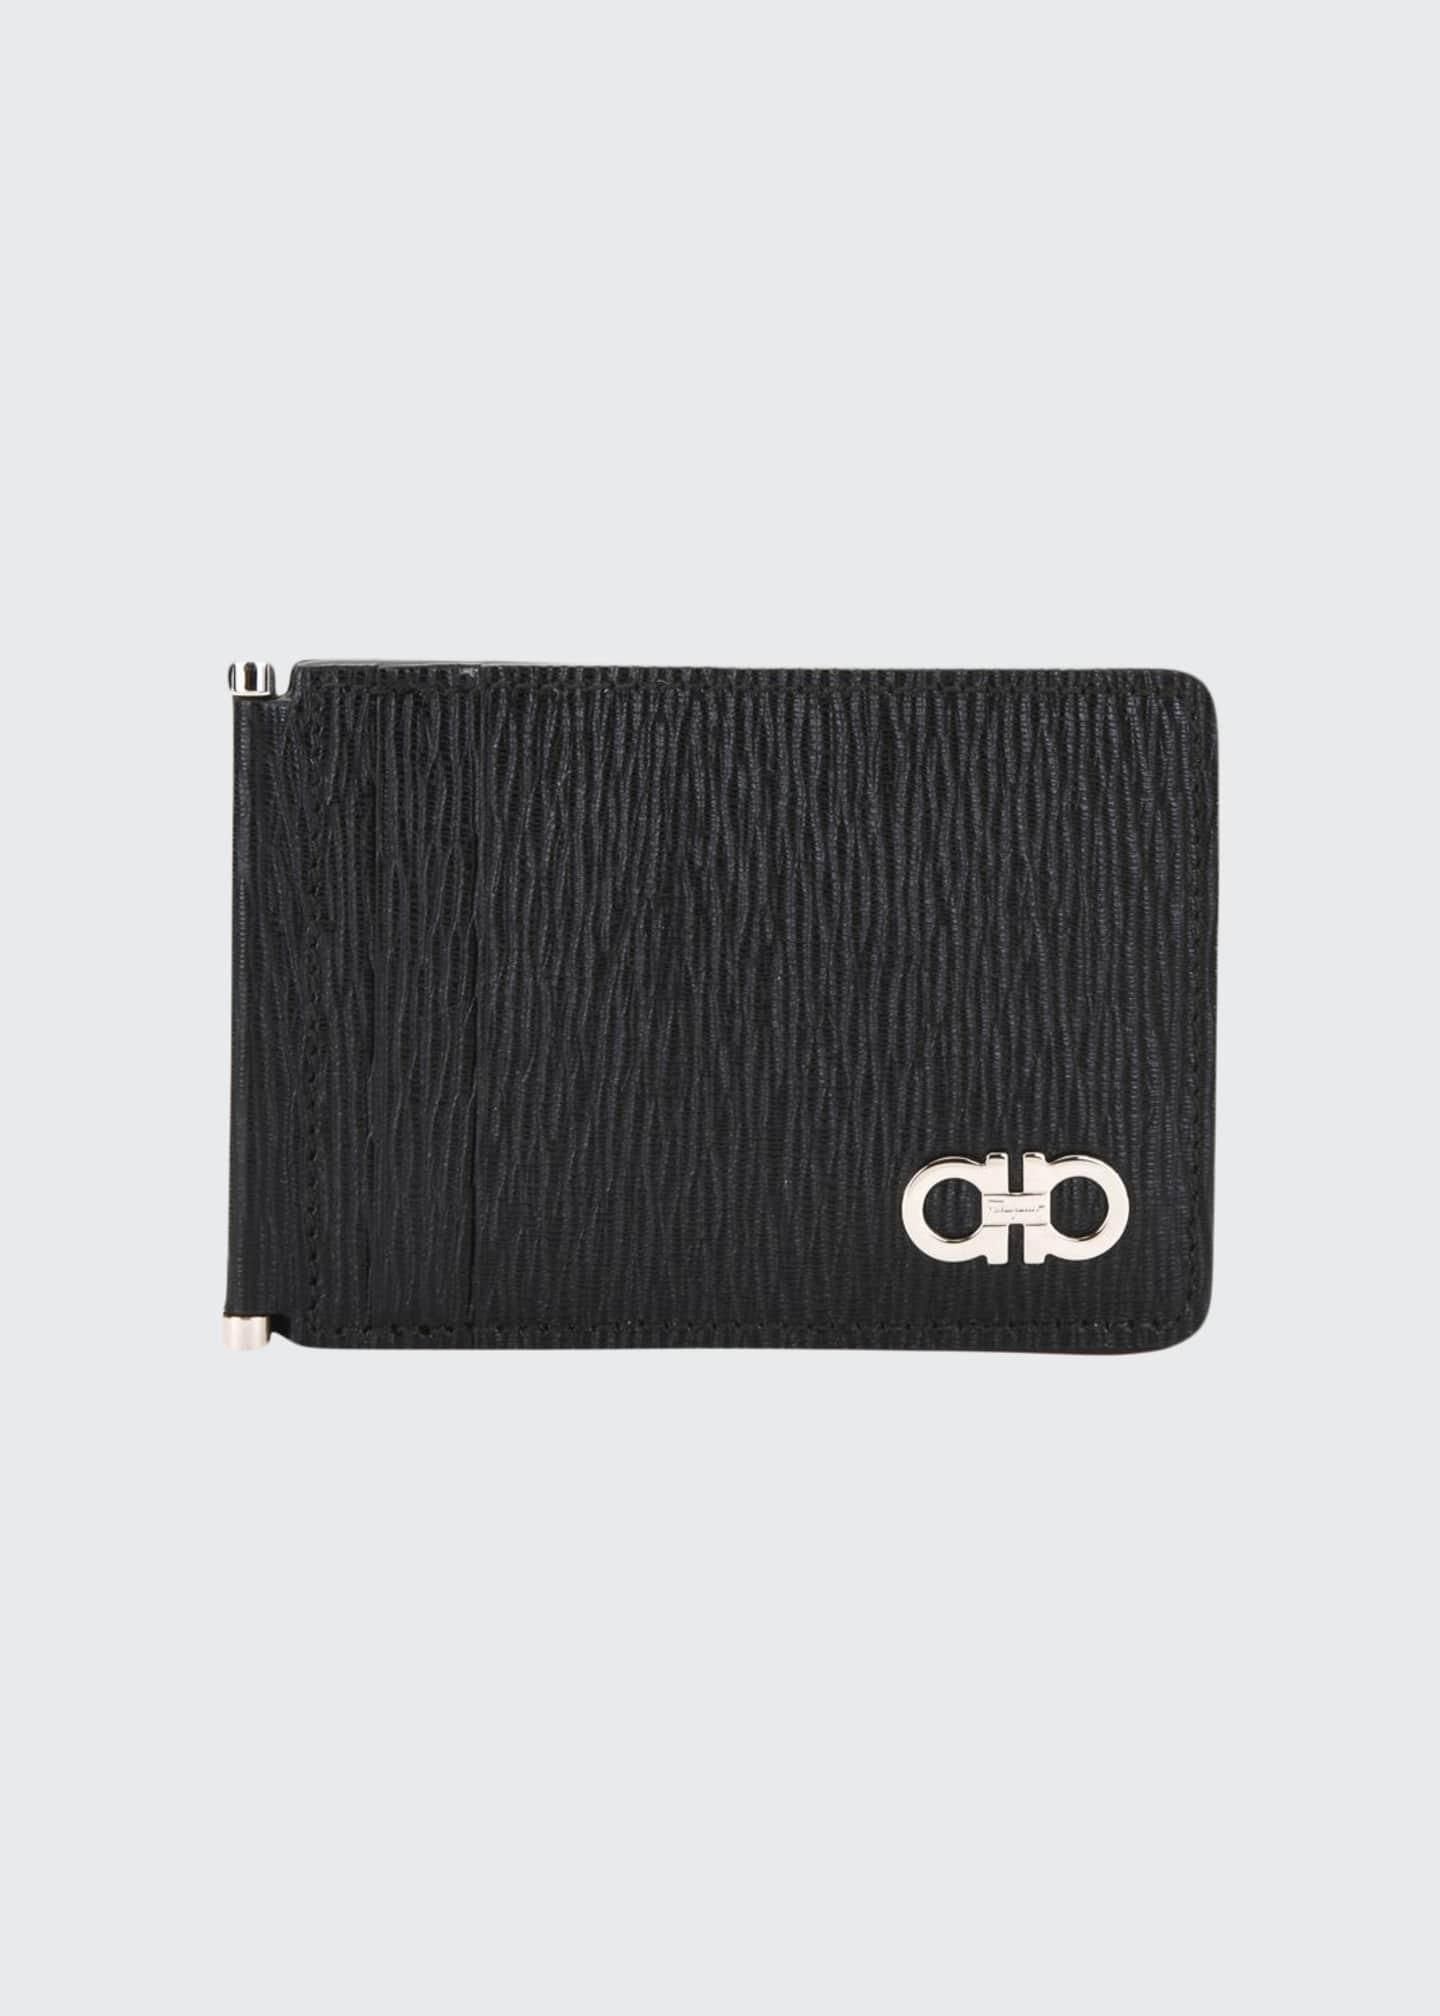 Salvatore Ferragamo Men's Leather Card Case w/ Brass